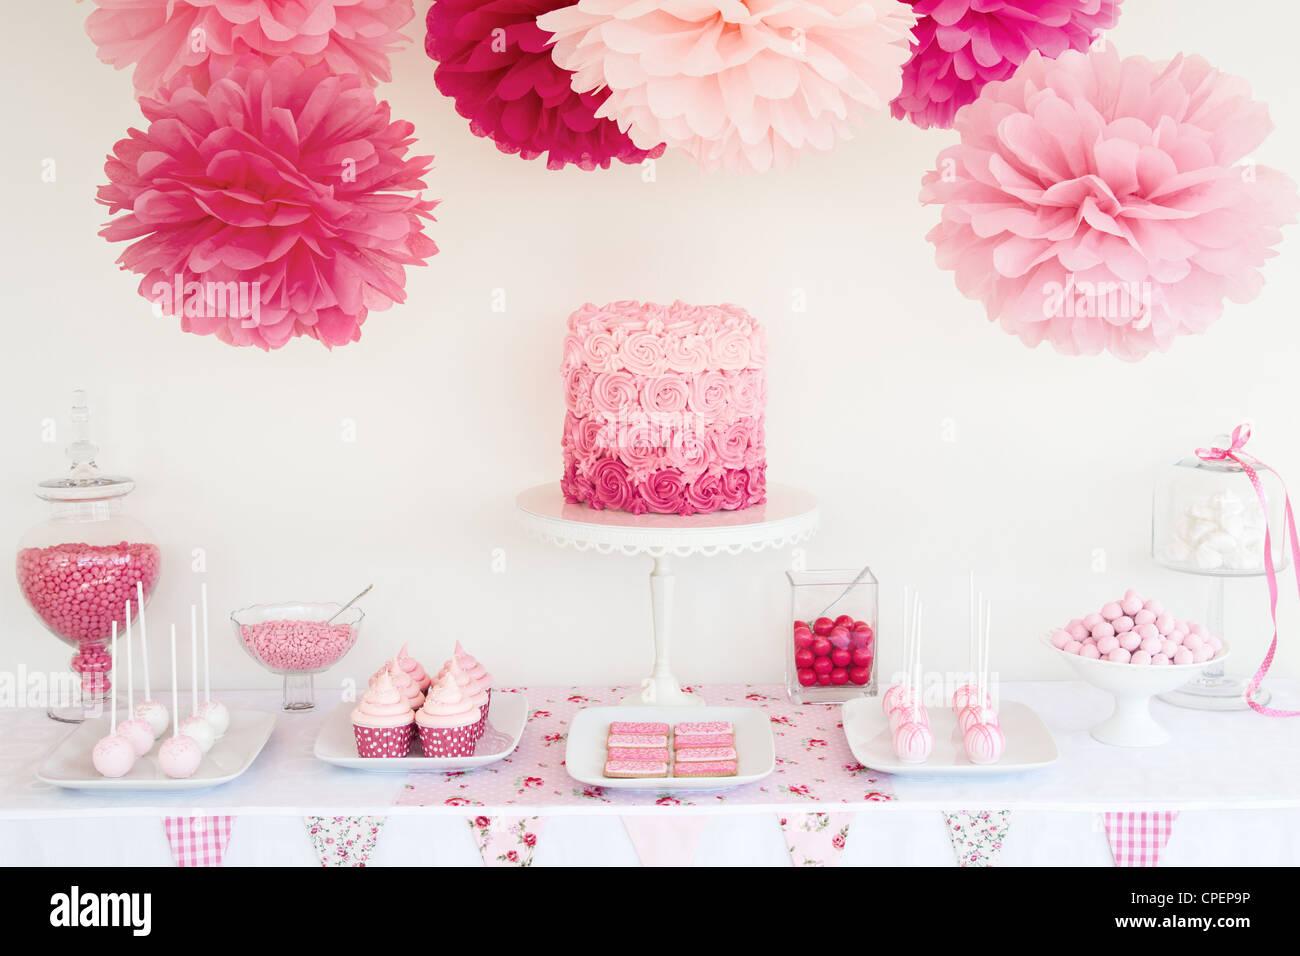 Dessert table - Stock Image